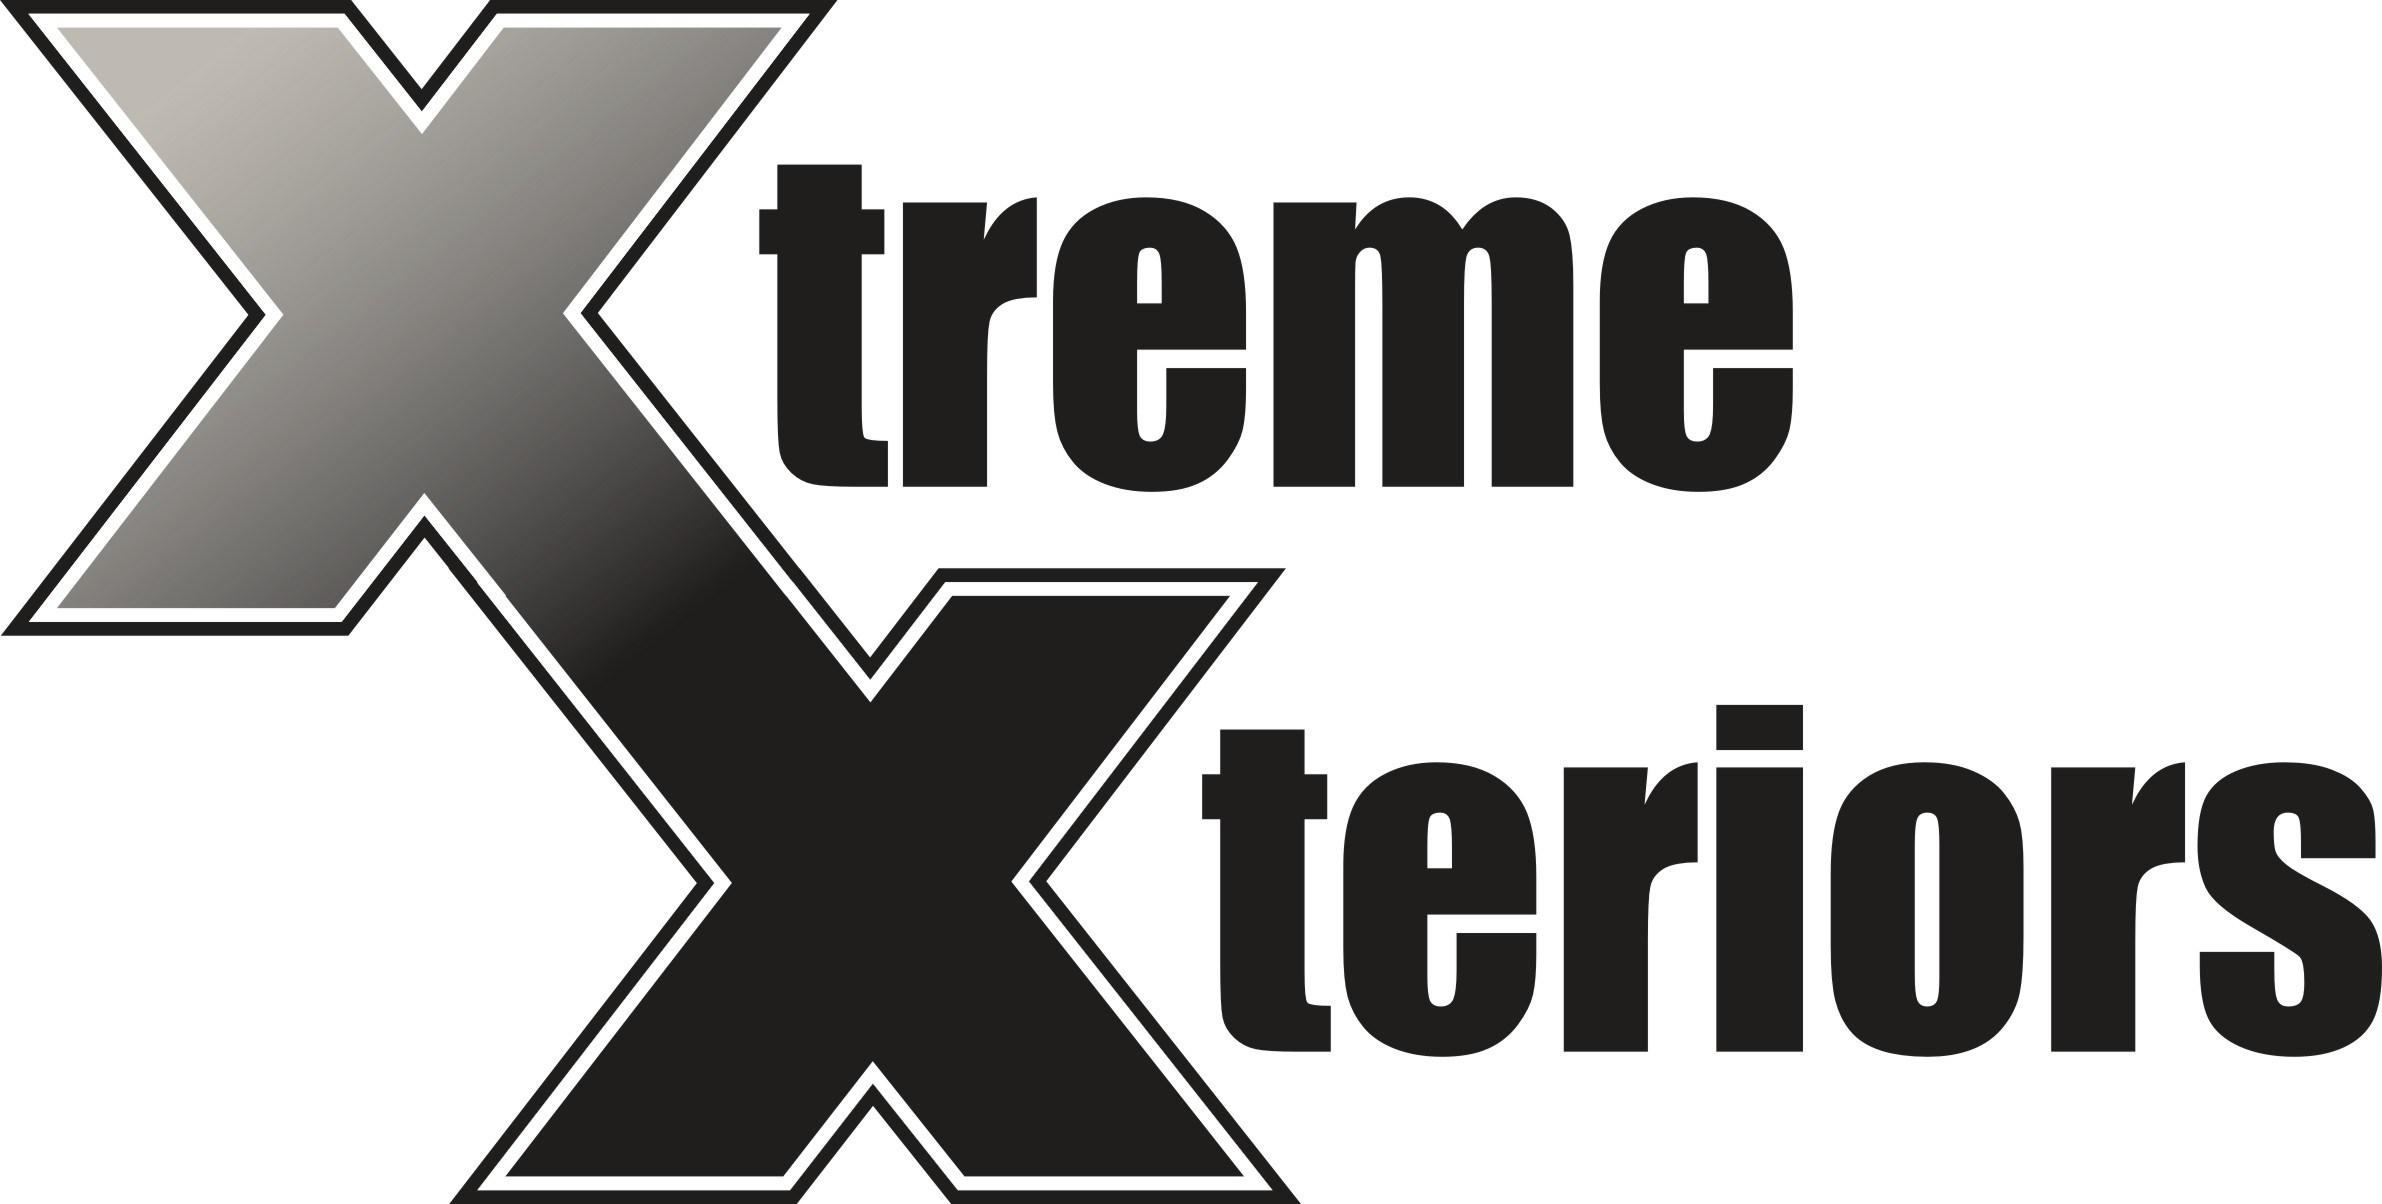 XTREME XTERIORS logo